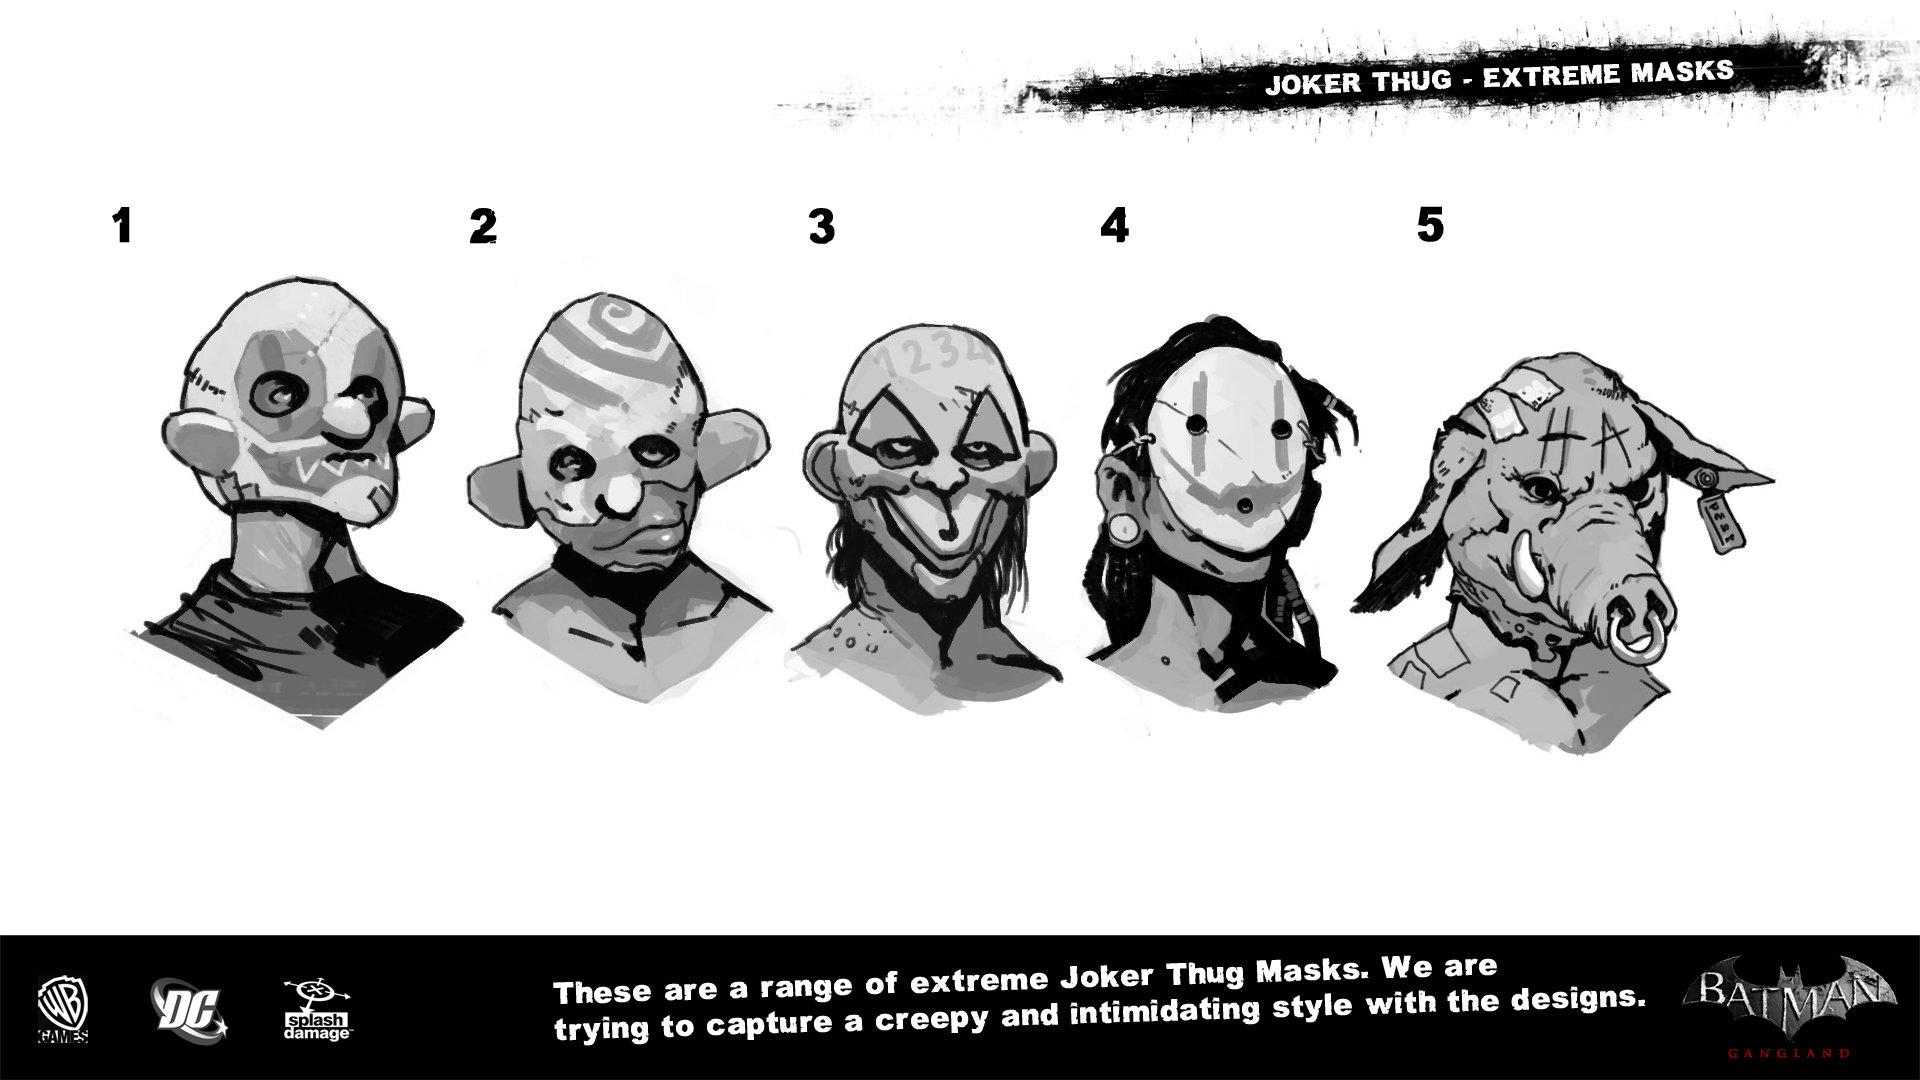 Manuel augusto dischinger moura splashdamage joker thug extreme masks